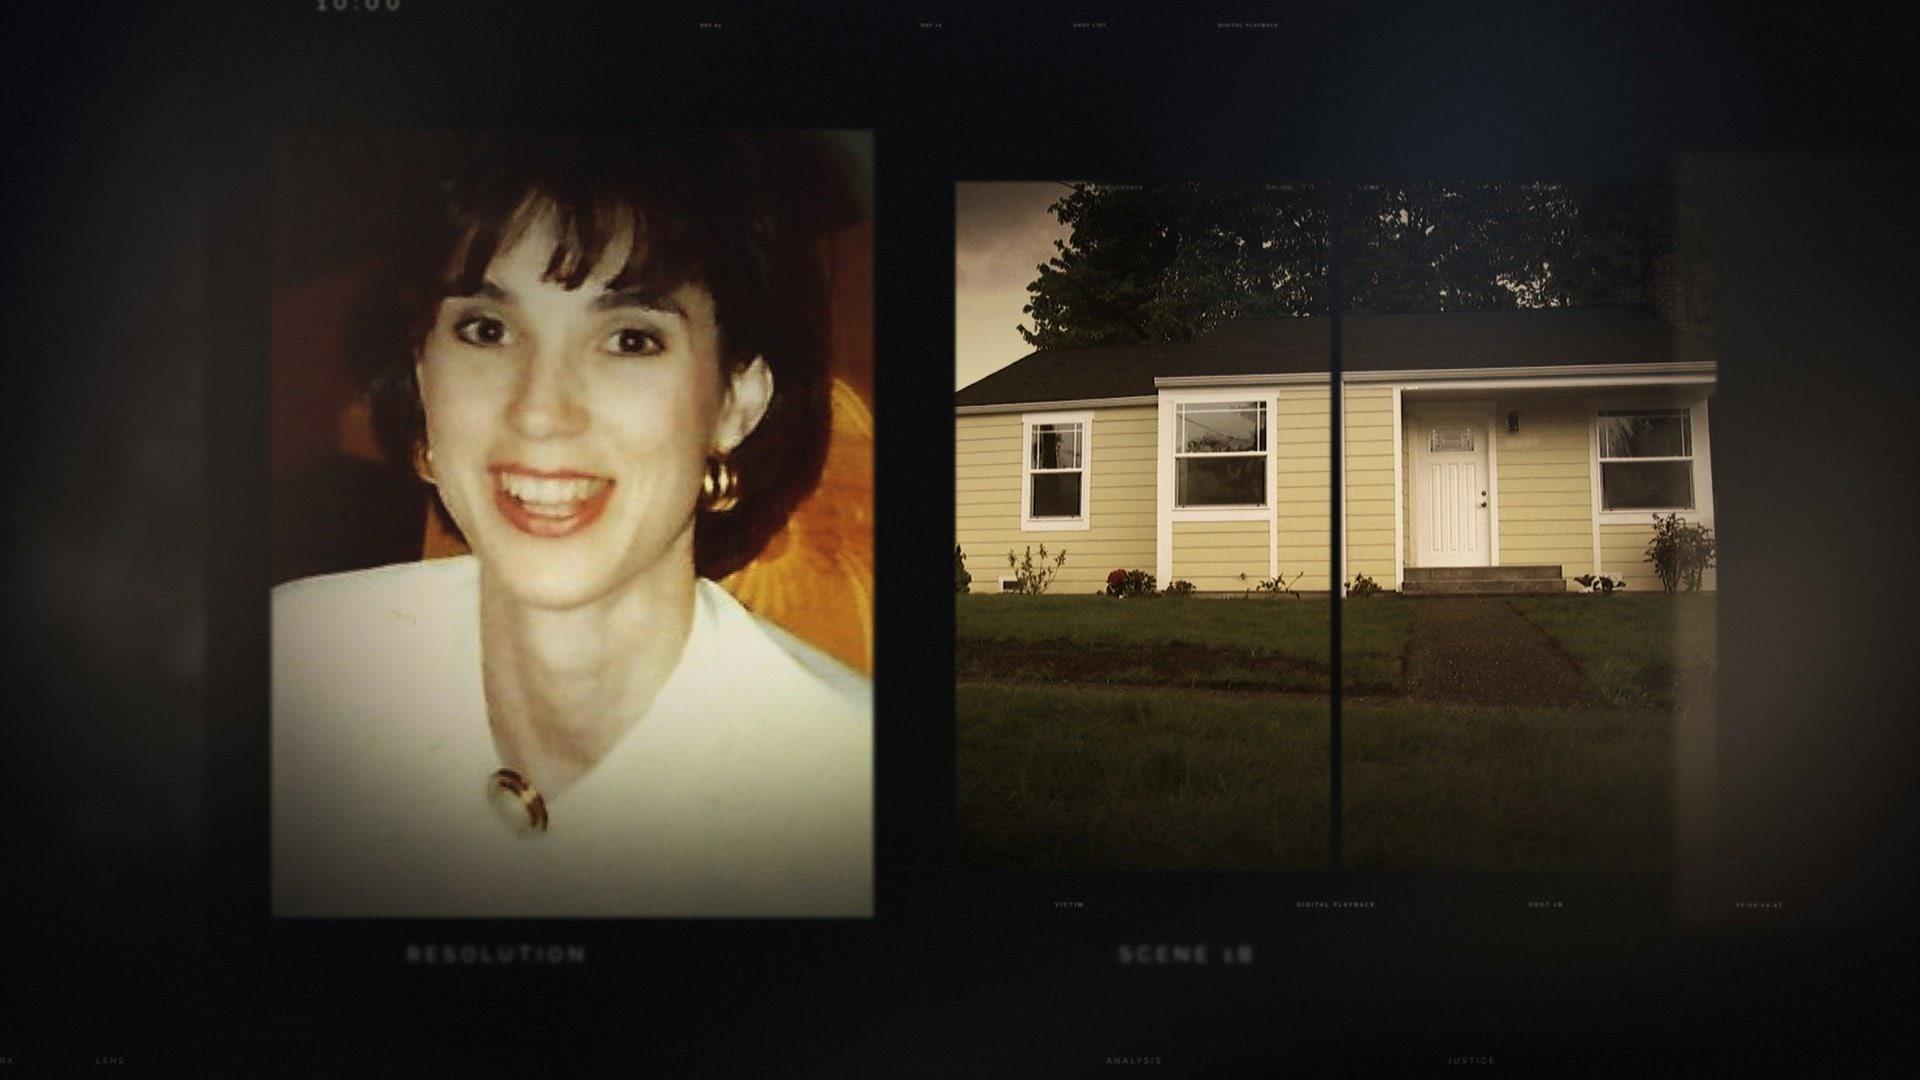 The Disappearance of Sandi Johnson